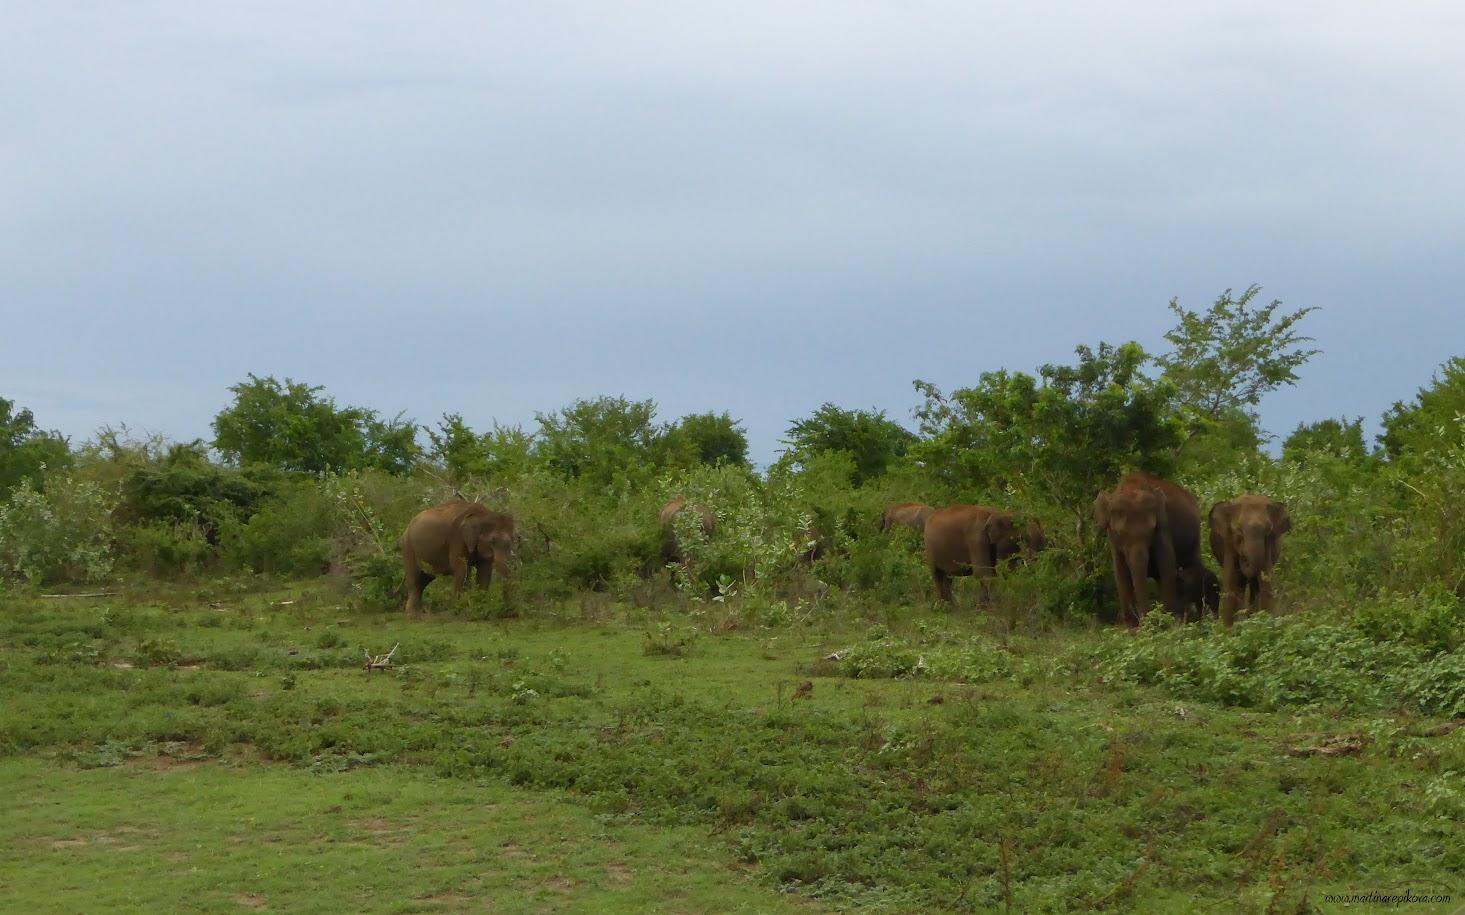 Slon, Uda Walawe, Sri Lanka